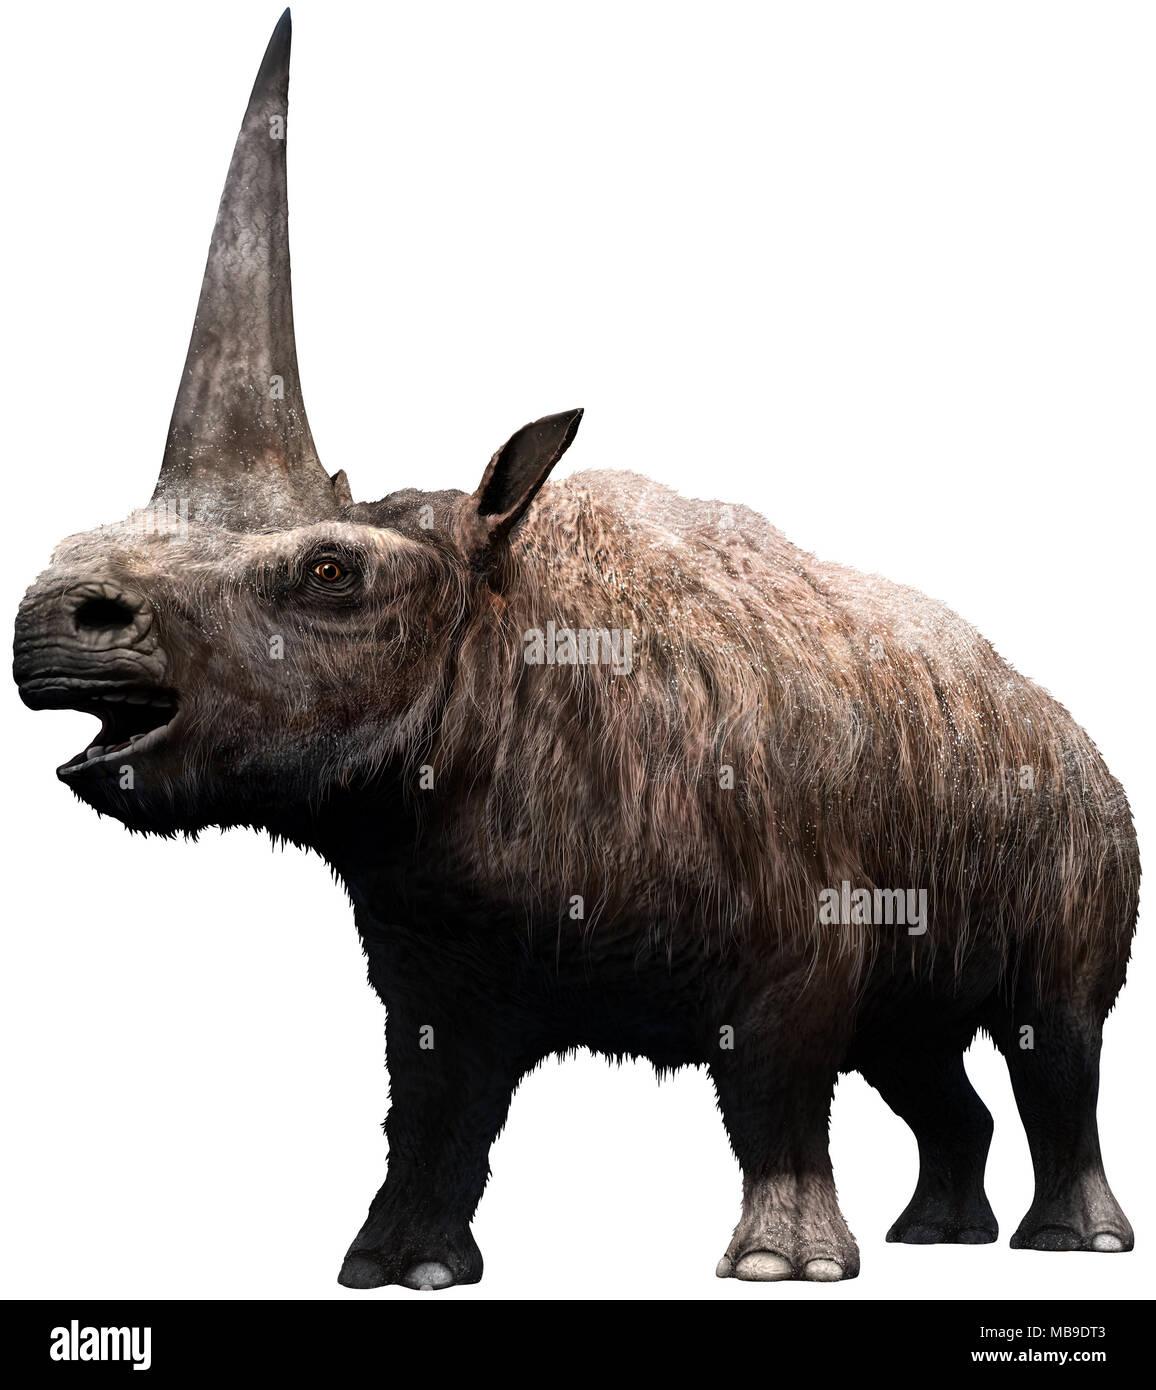 Elasmotherium - Stock Image